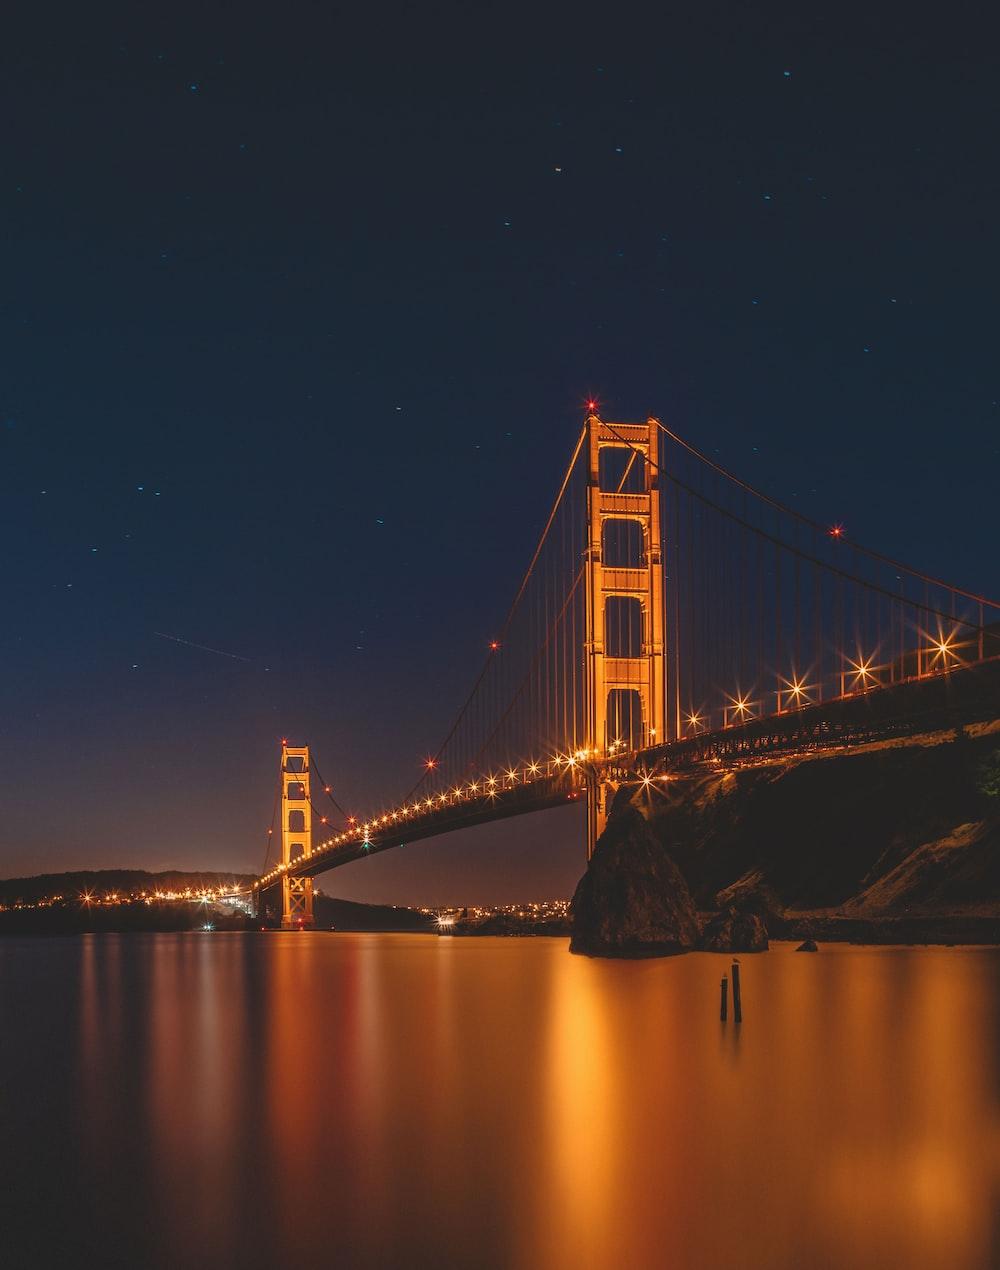 landscape photography of Golden Gate Bridge, San Francisco